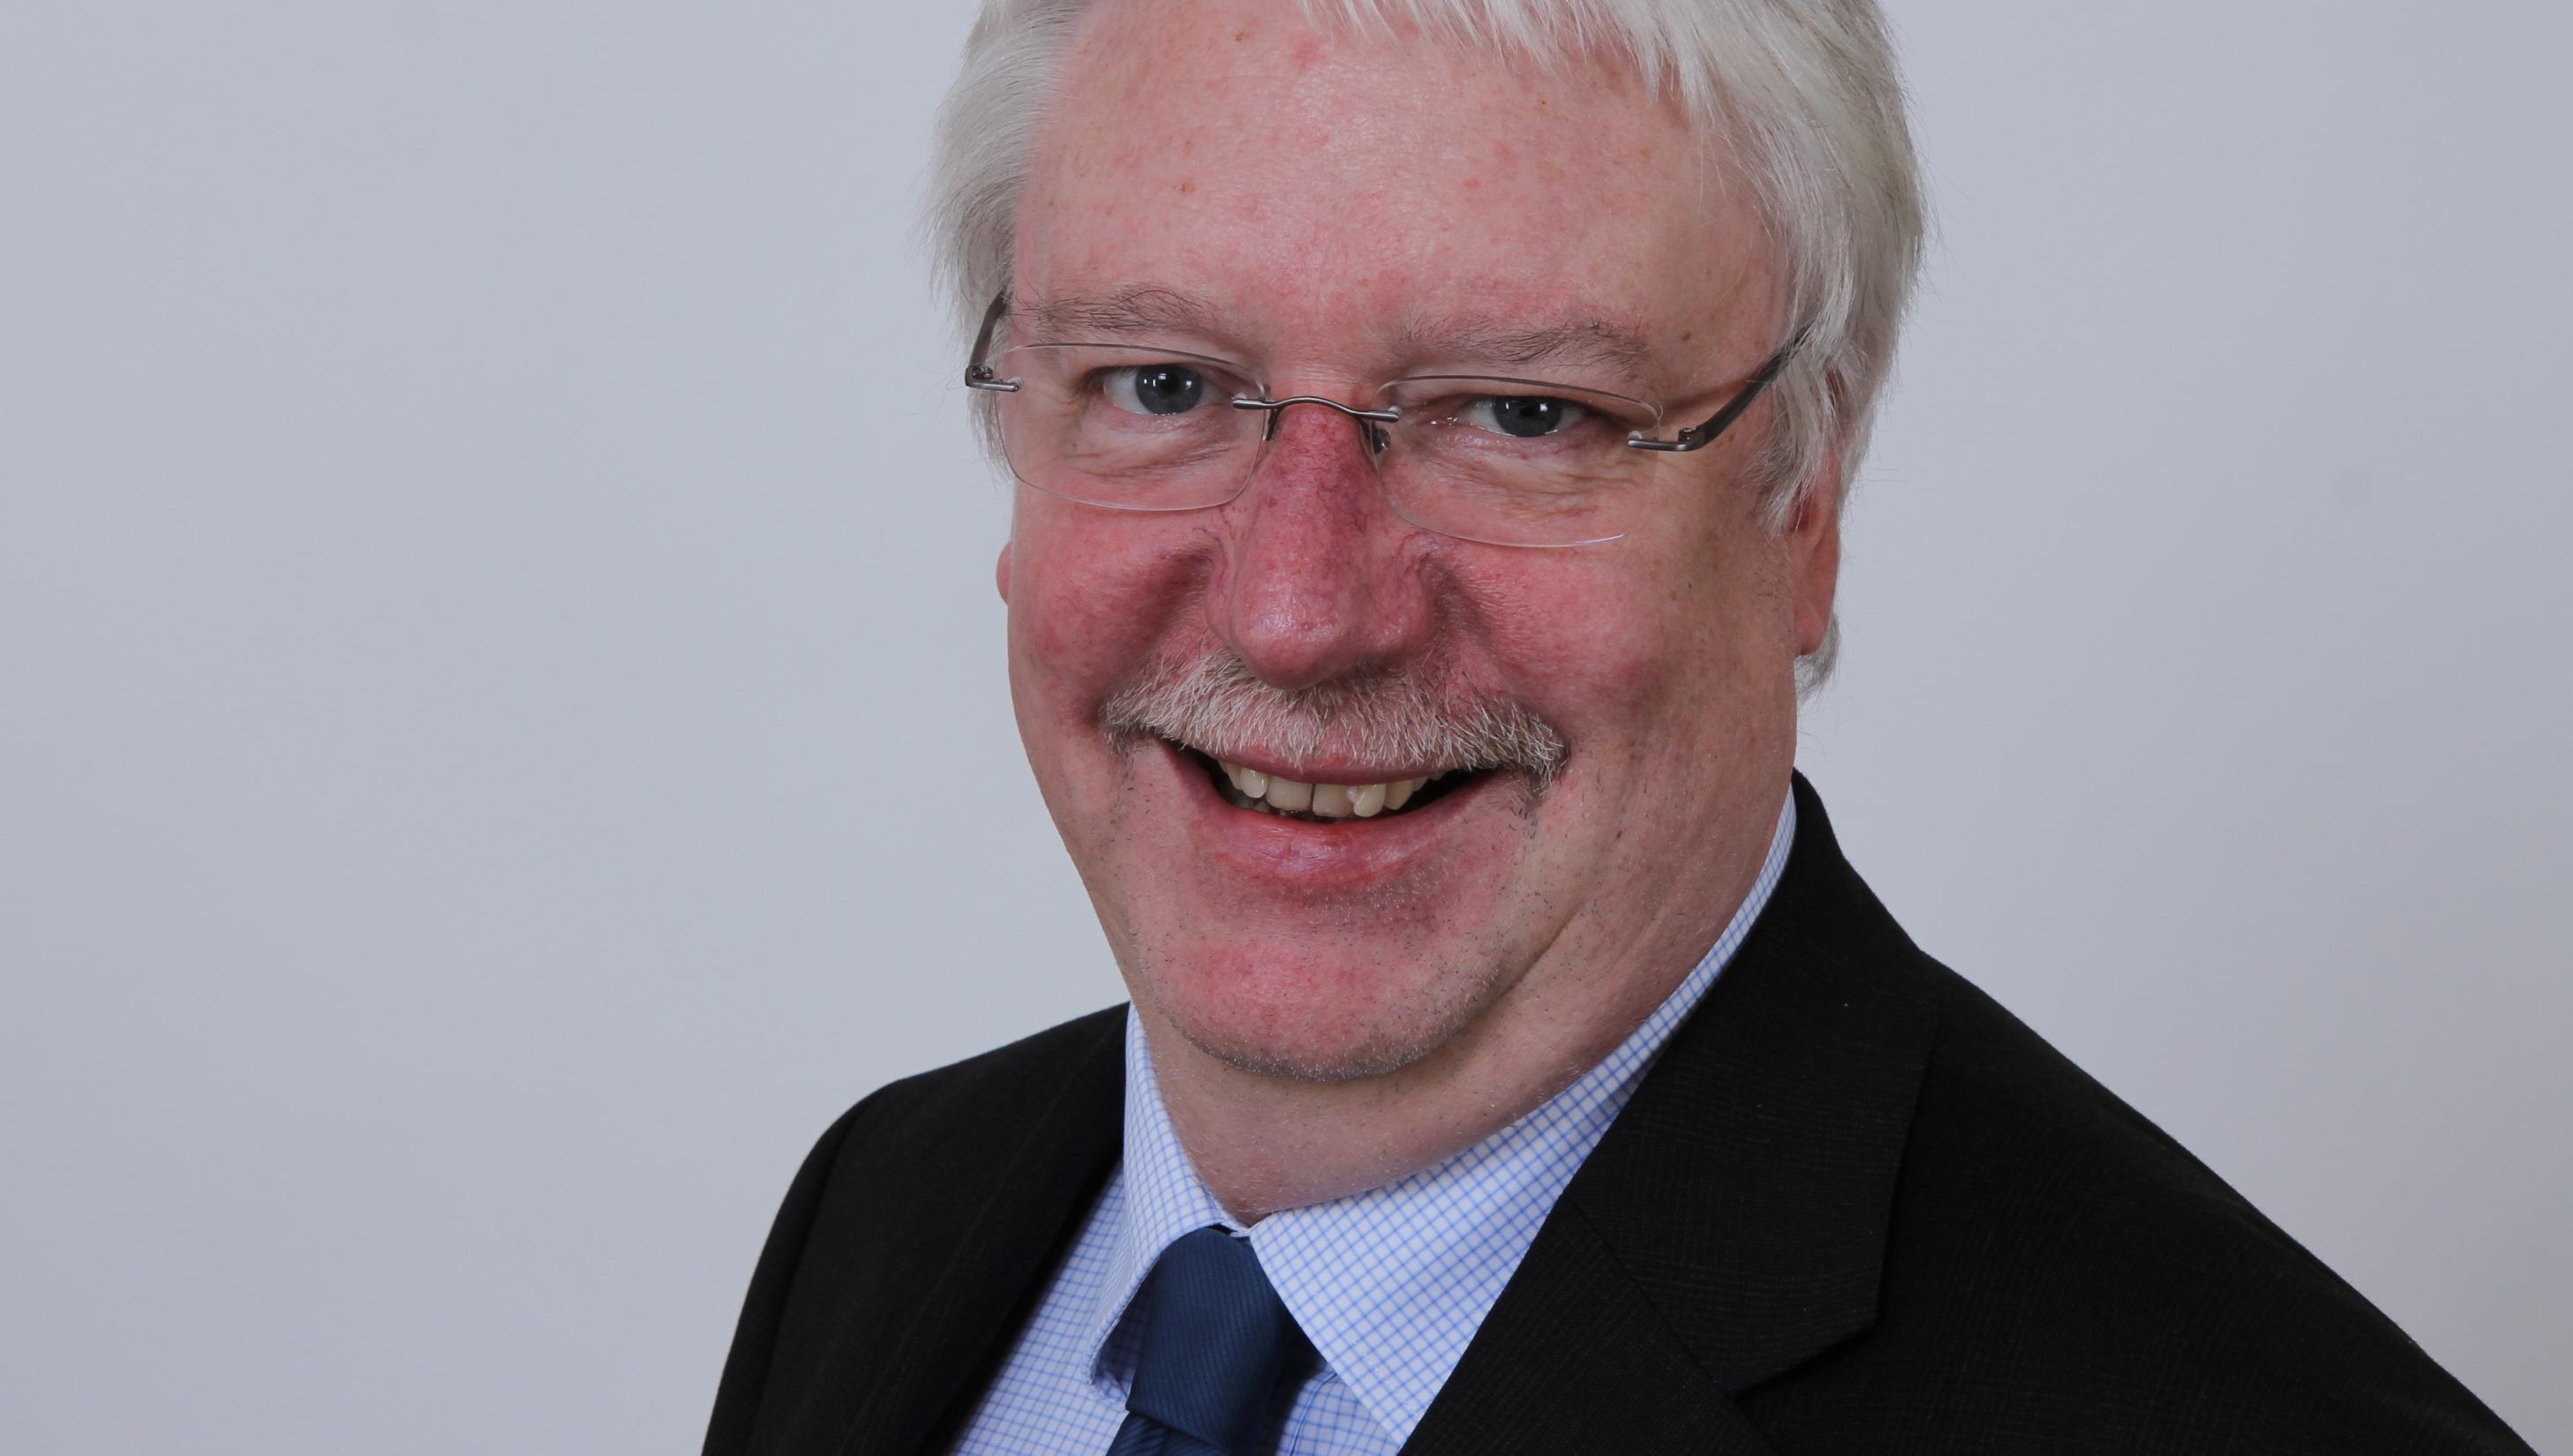 der hessiche Integrationsminister Jörg-Uwe Hahn (FDP)